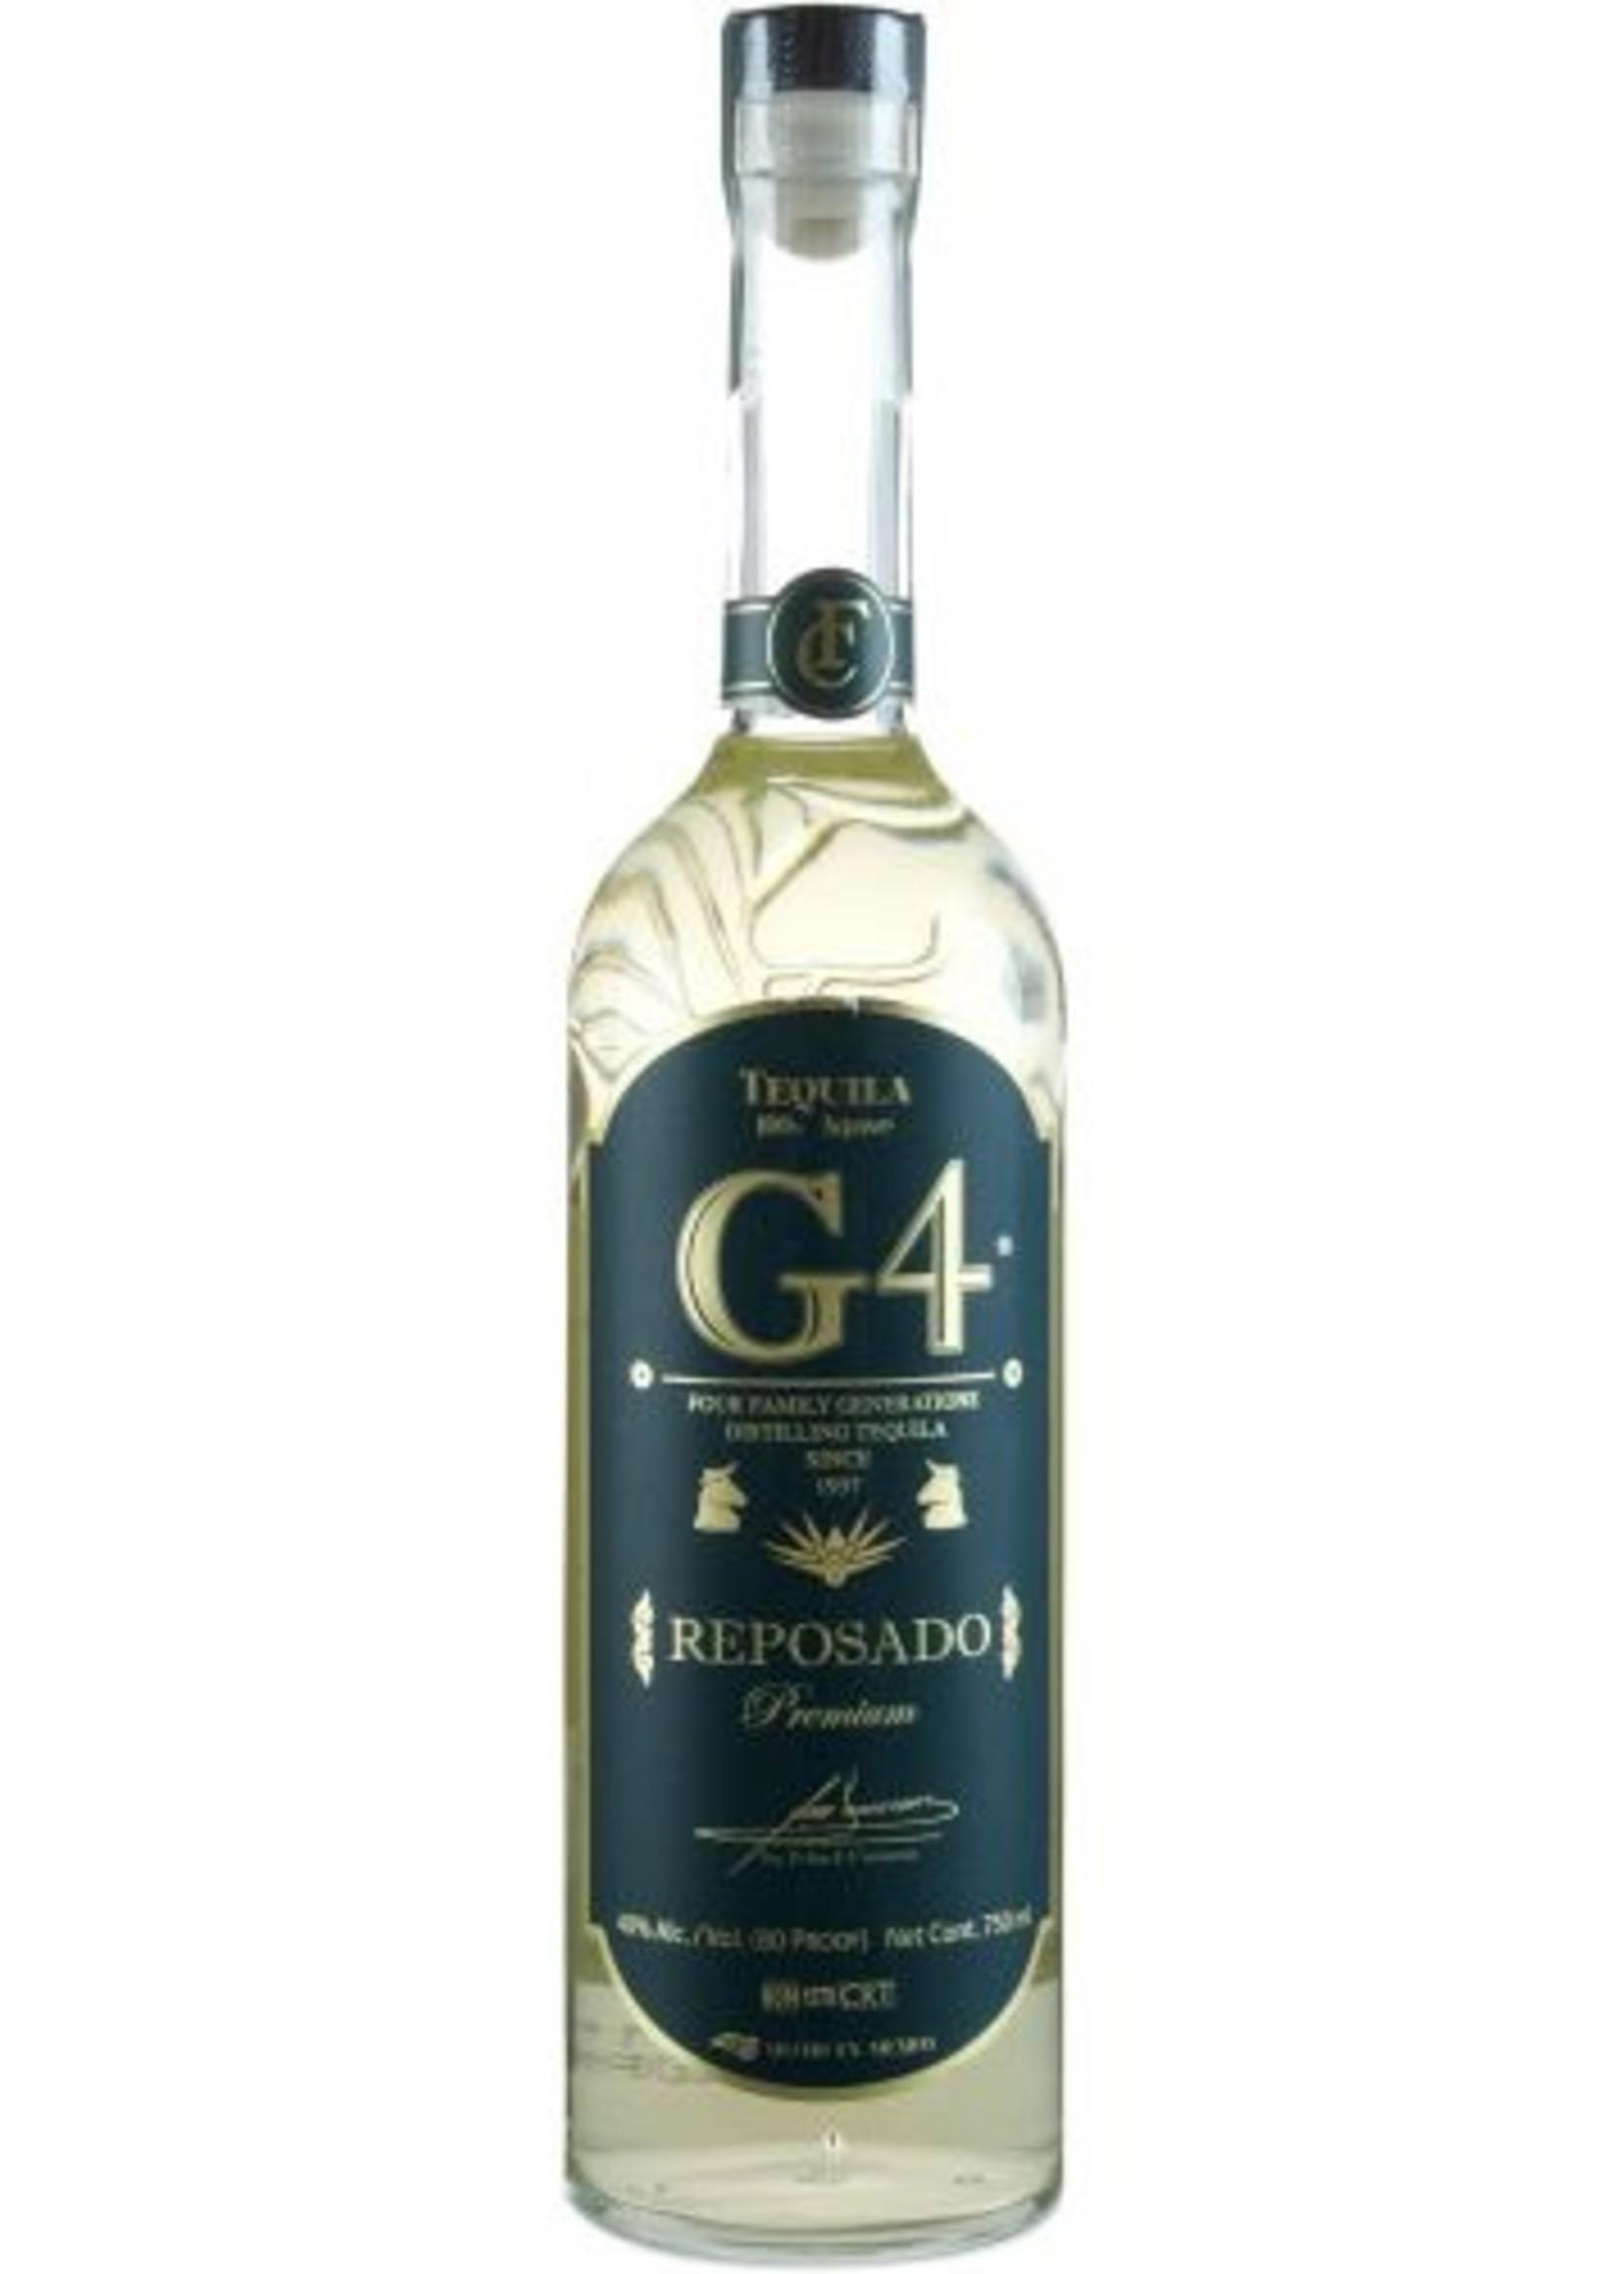 G4 Reposado Estate Grown Tequila